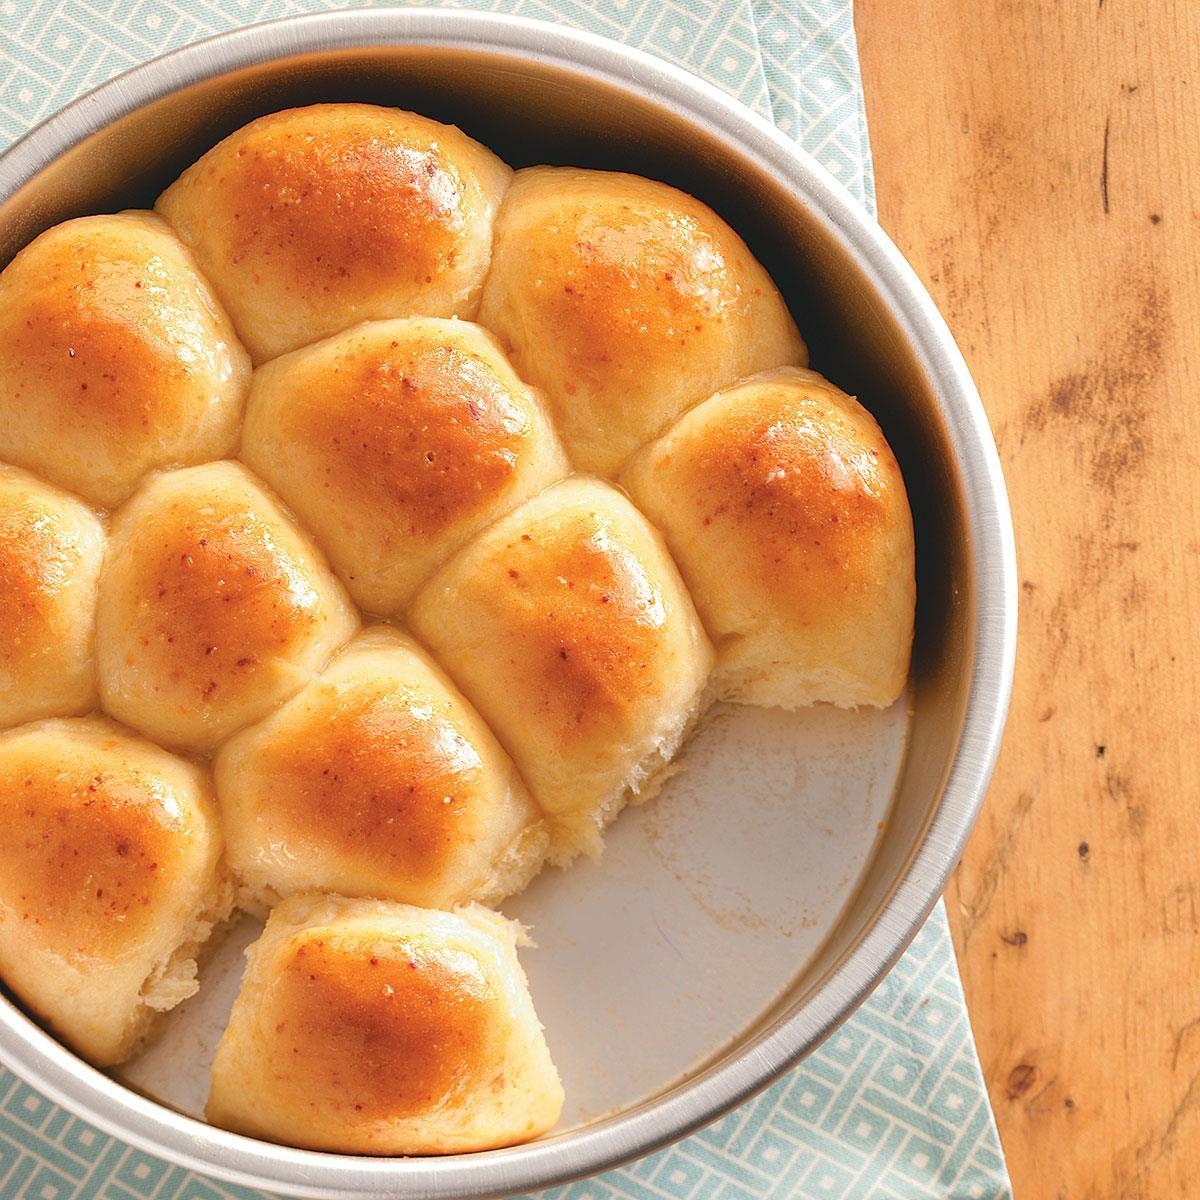 Baker S Dozen Yeast Rolls Recipe Taste Of Home